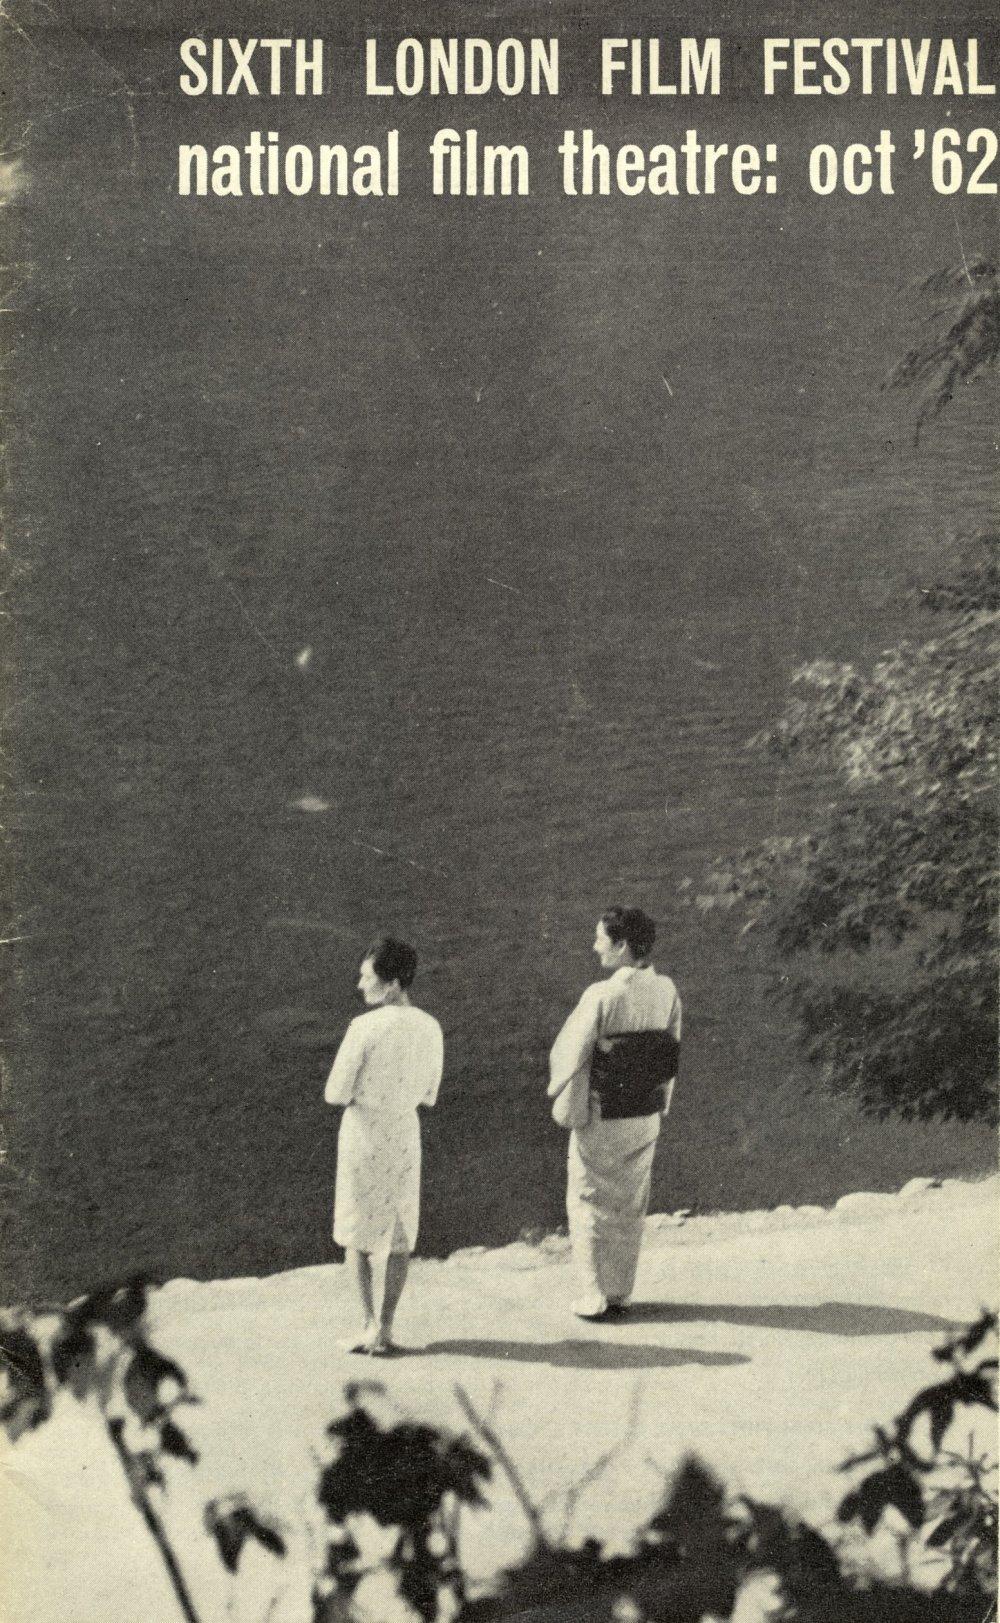 LFF brochure 1962